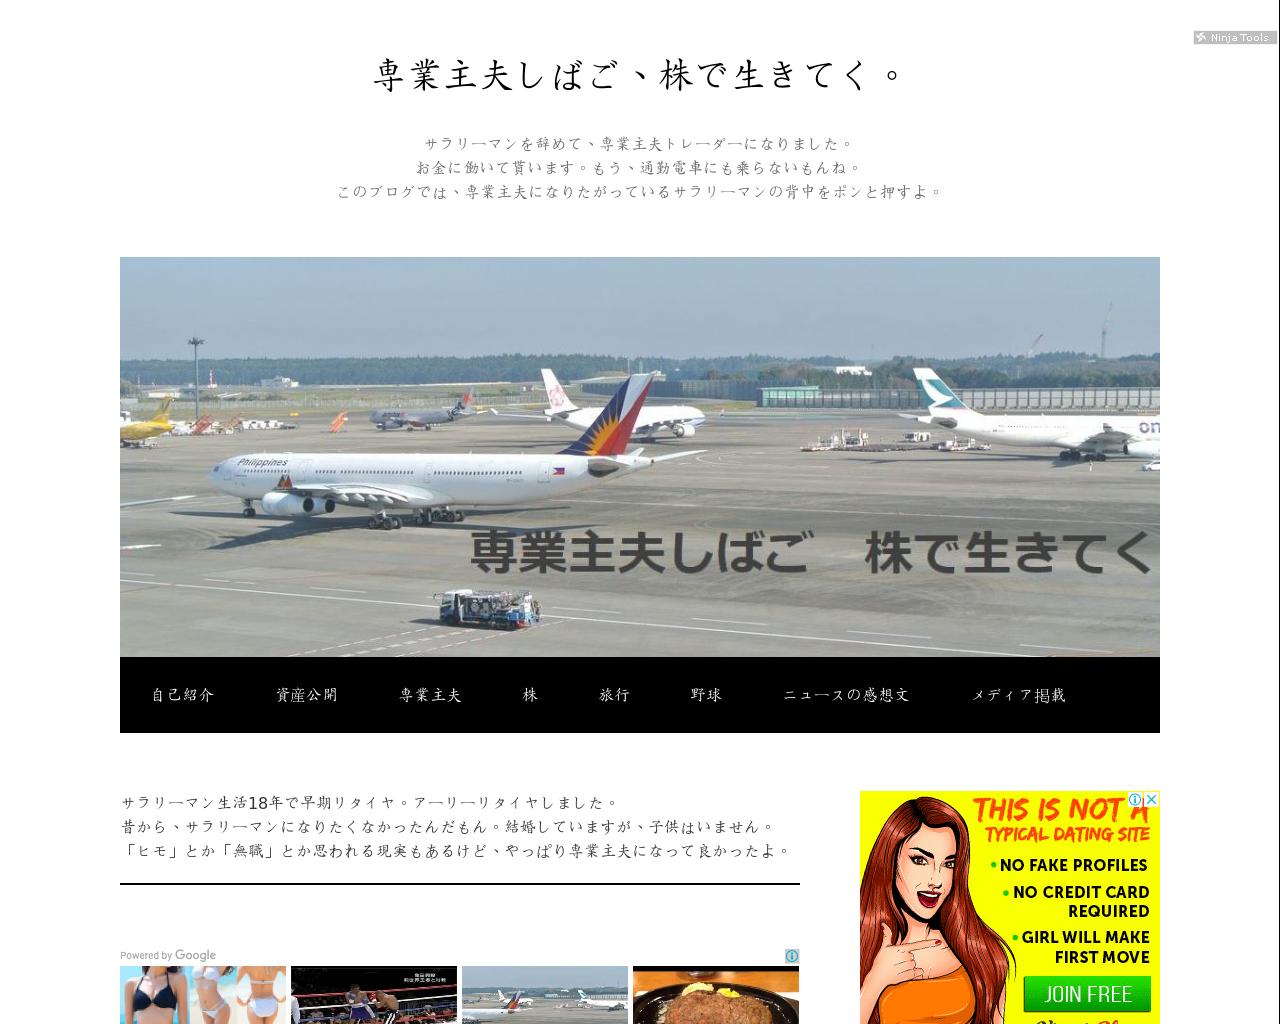 shibago.blog.jp(2017/12/06 22:56:49)